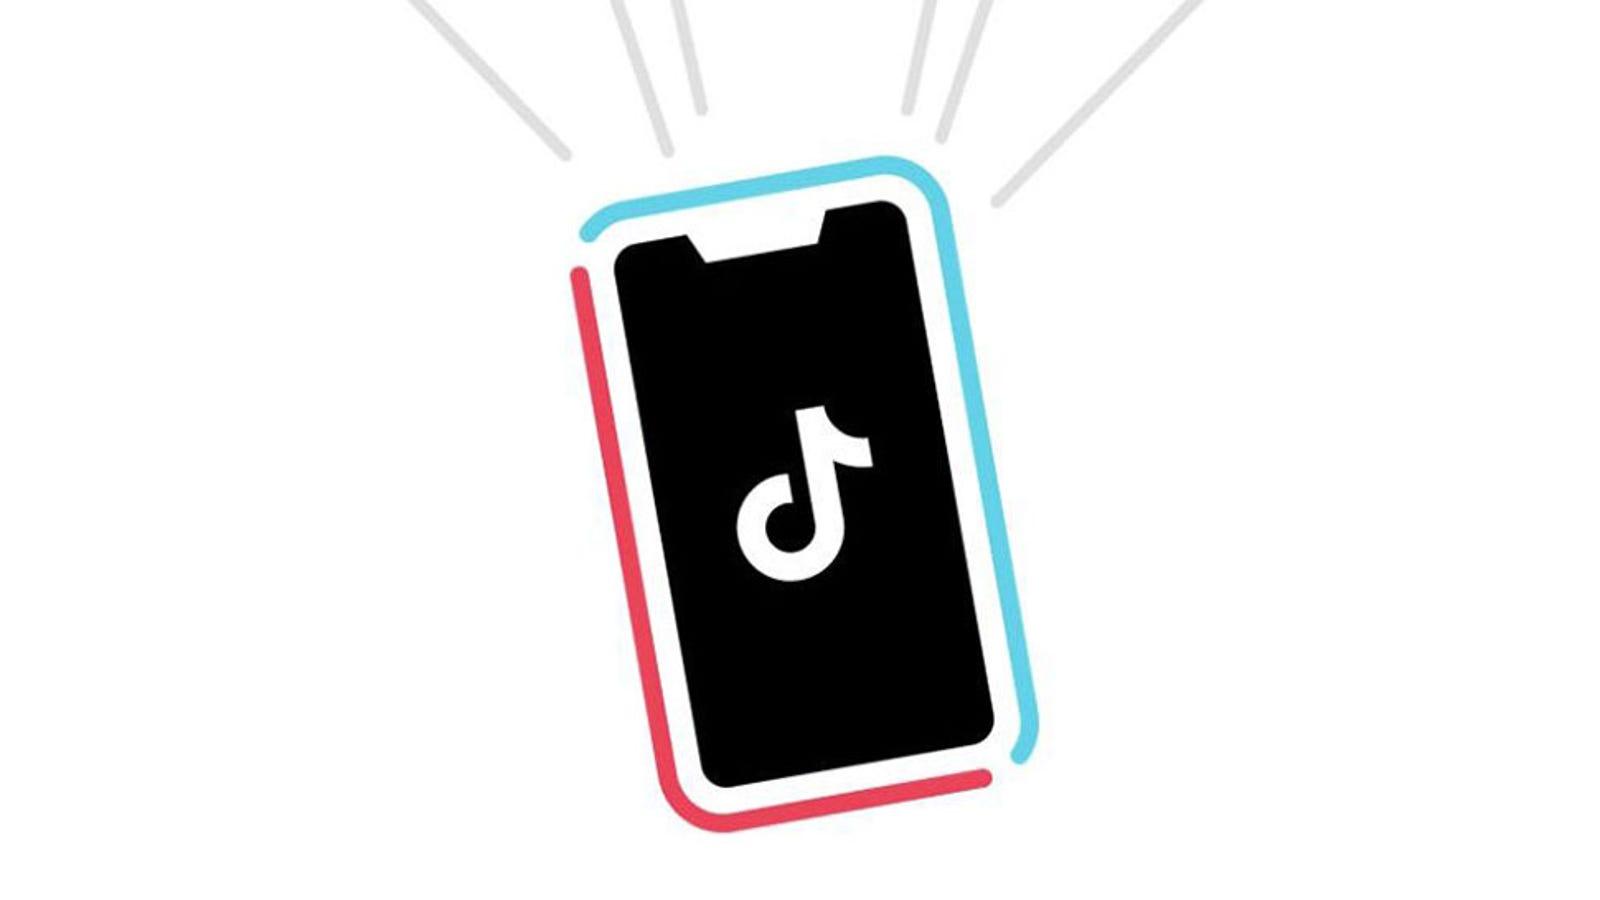 TikTok Owner ByteDance Is Getting Into the Phone Biz [Updated]